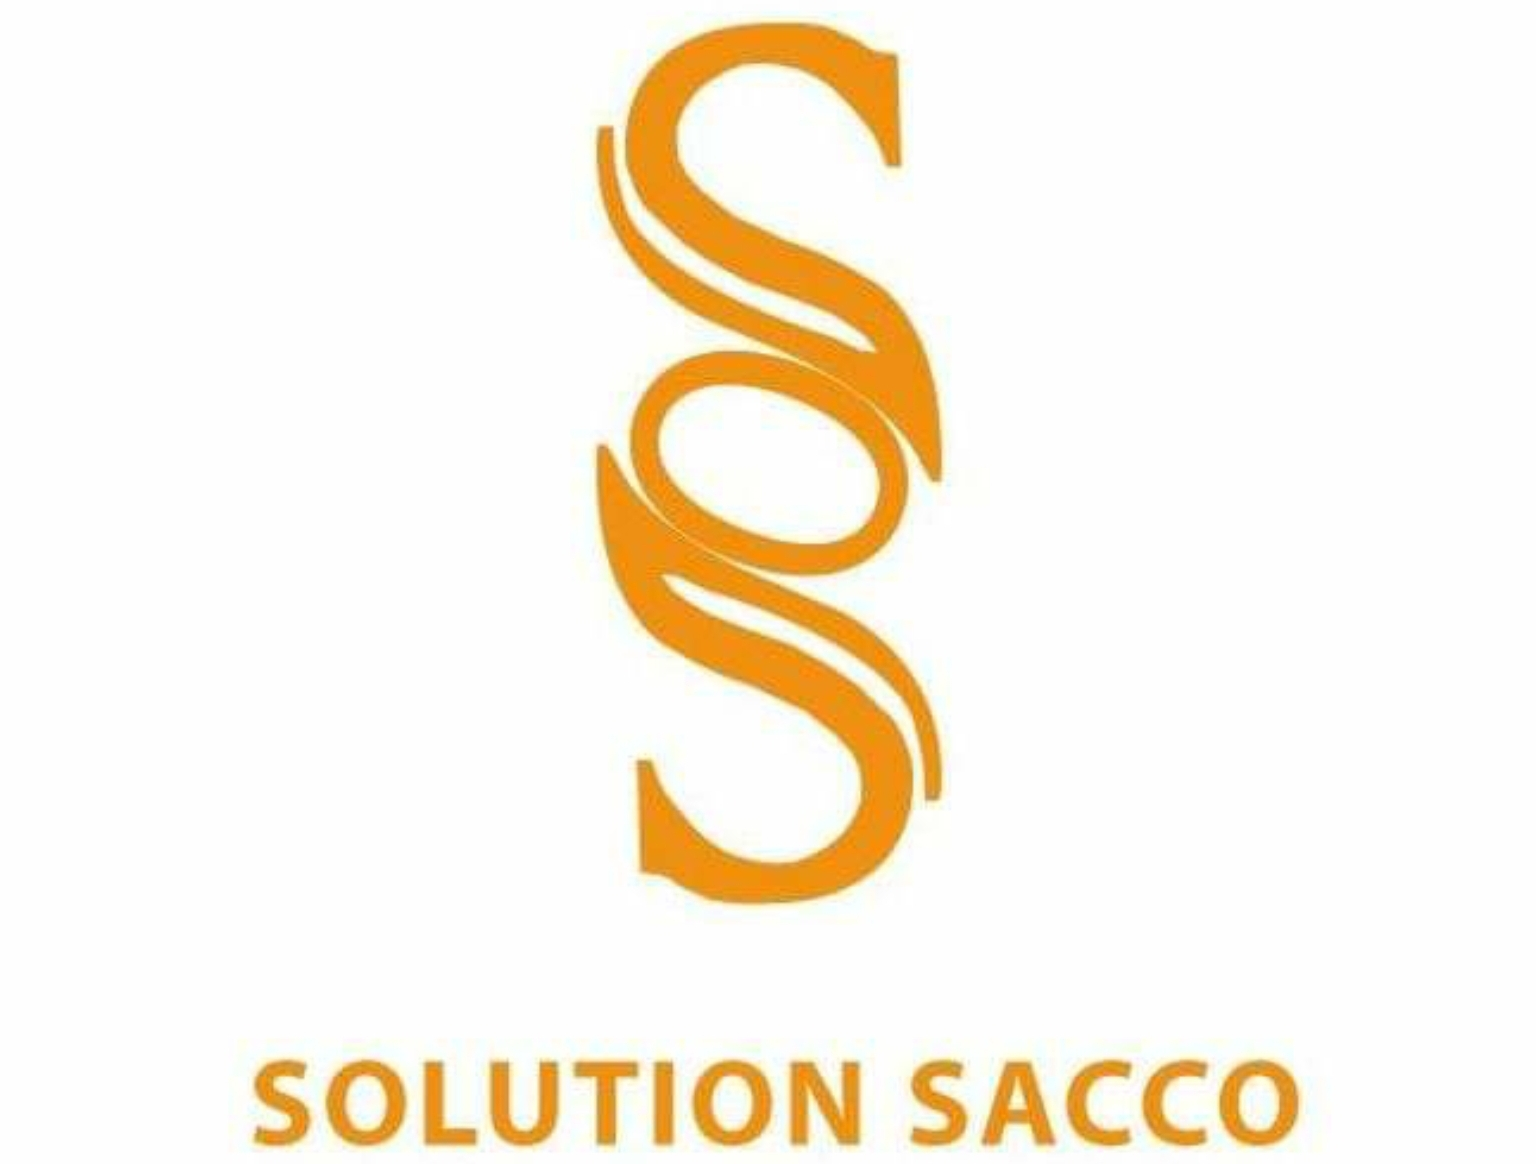 Solution Sacco